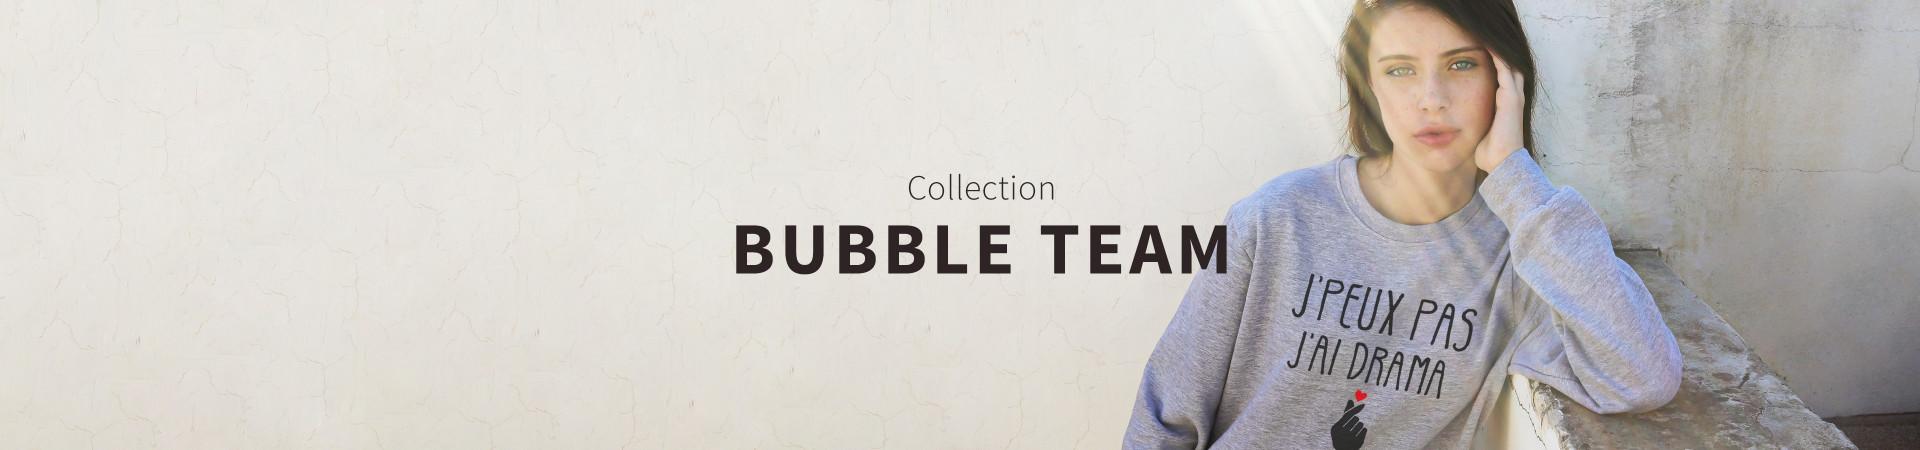 Bubble Team